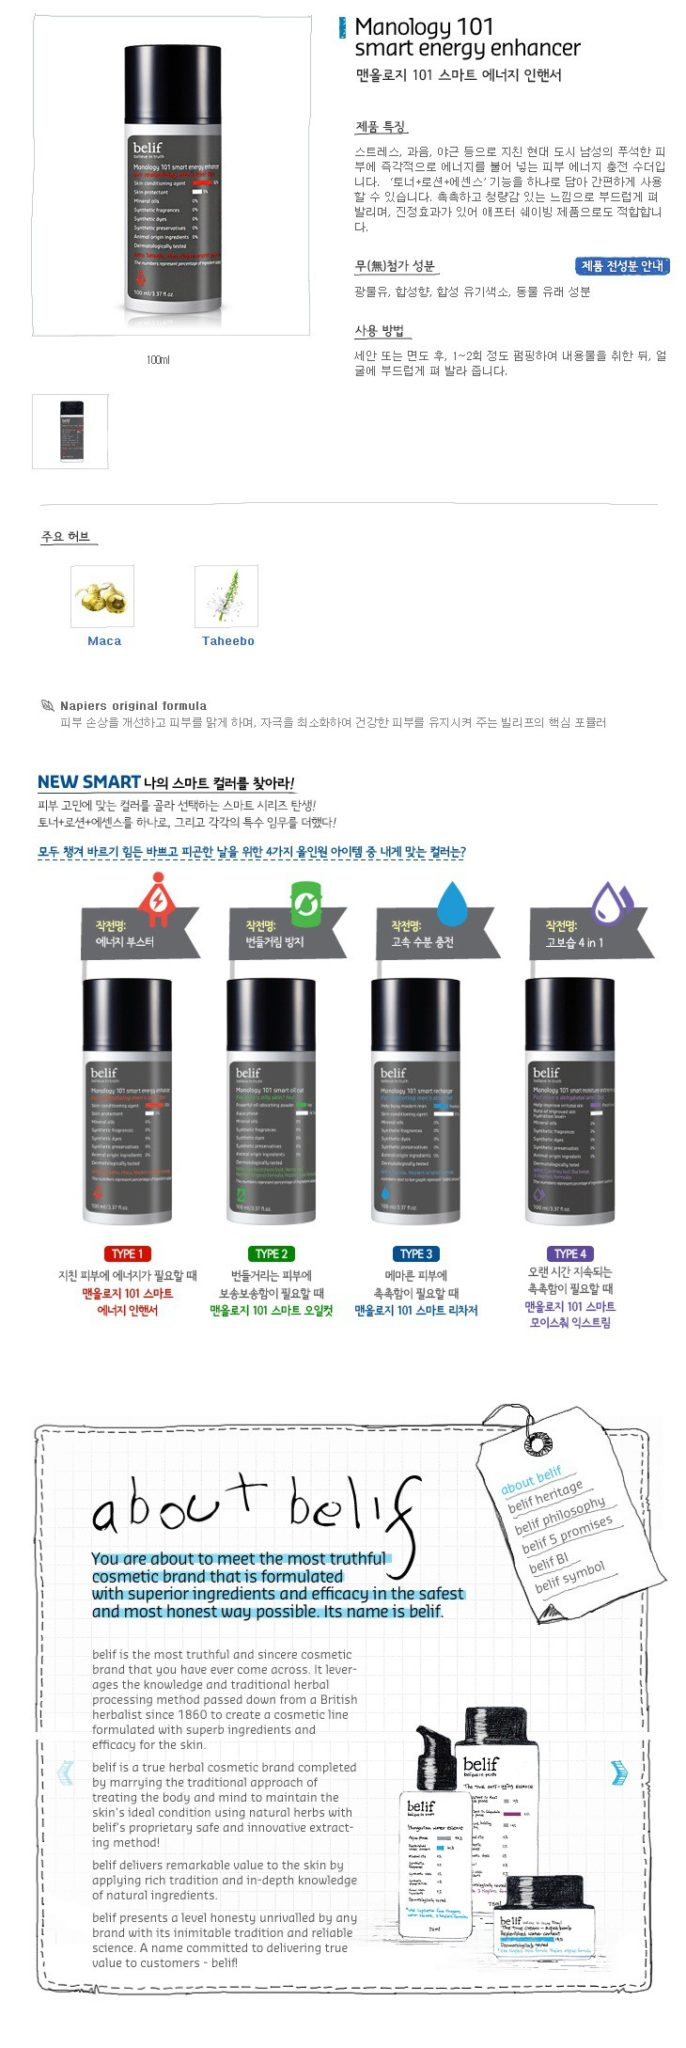 Belif Manology 101 Smart Energy Enhancer 100ml